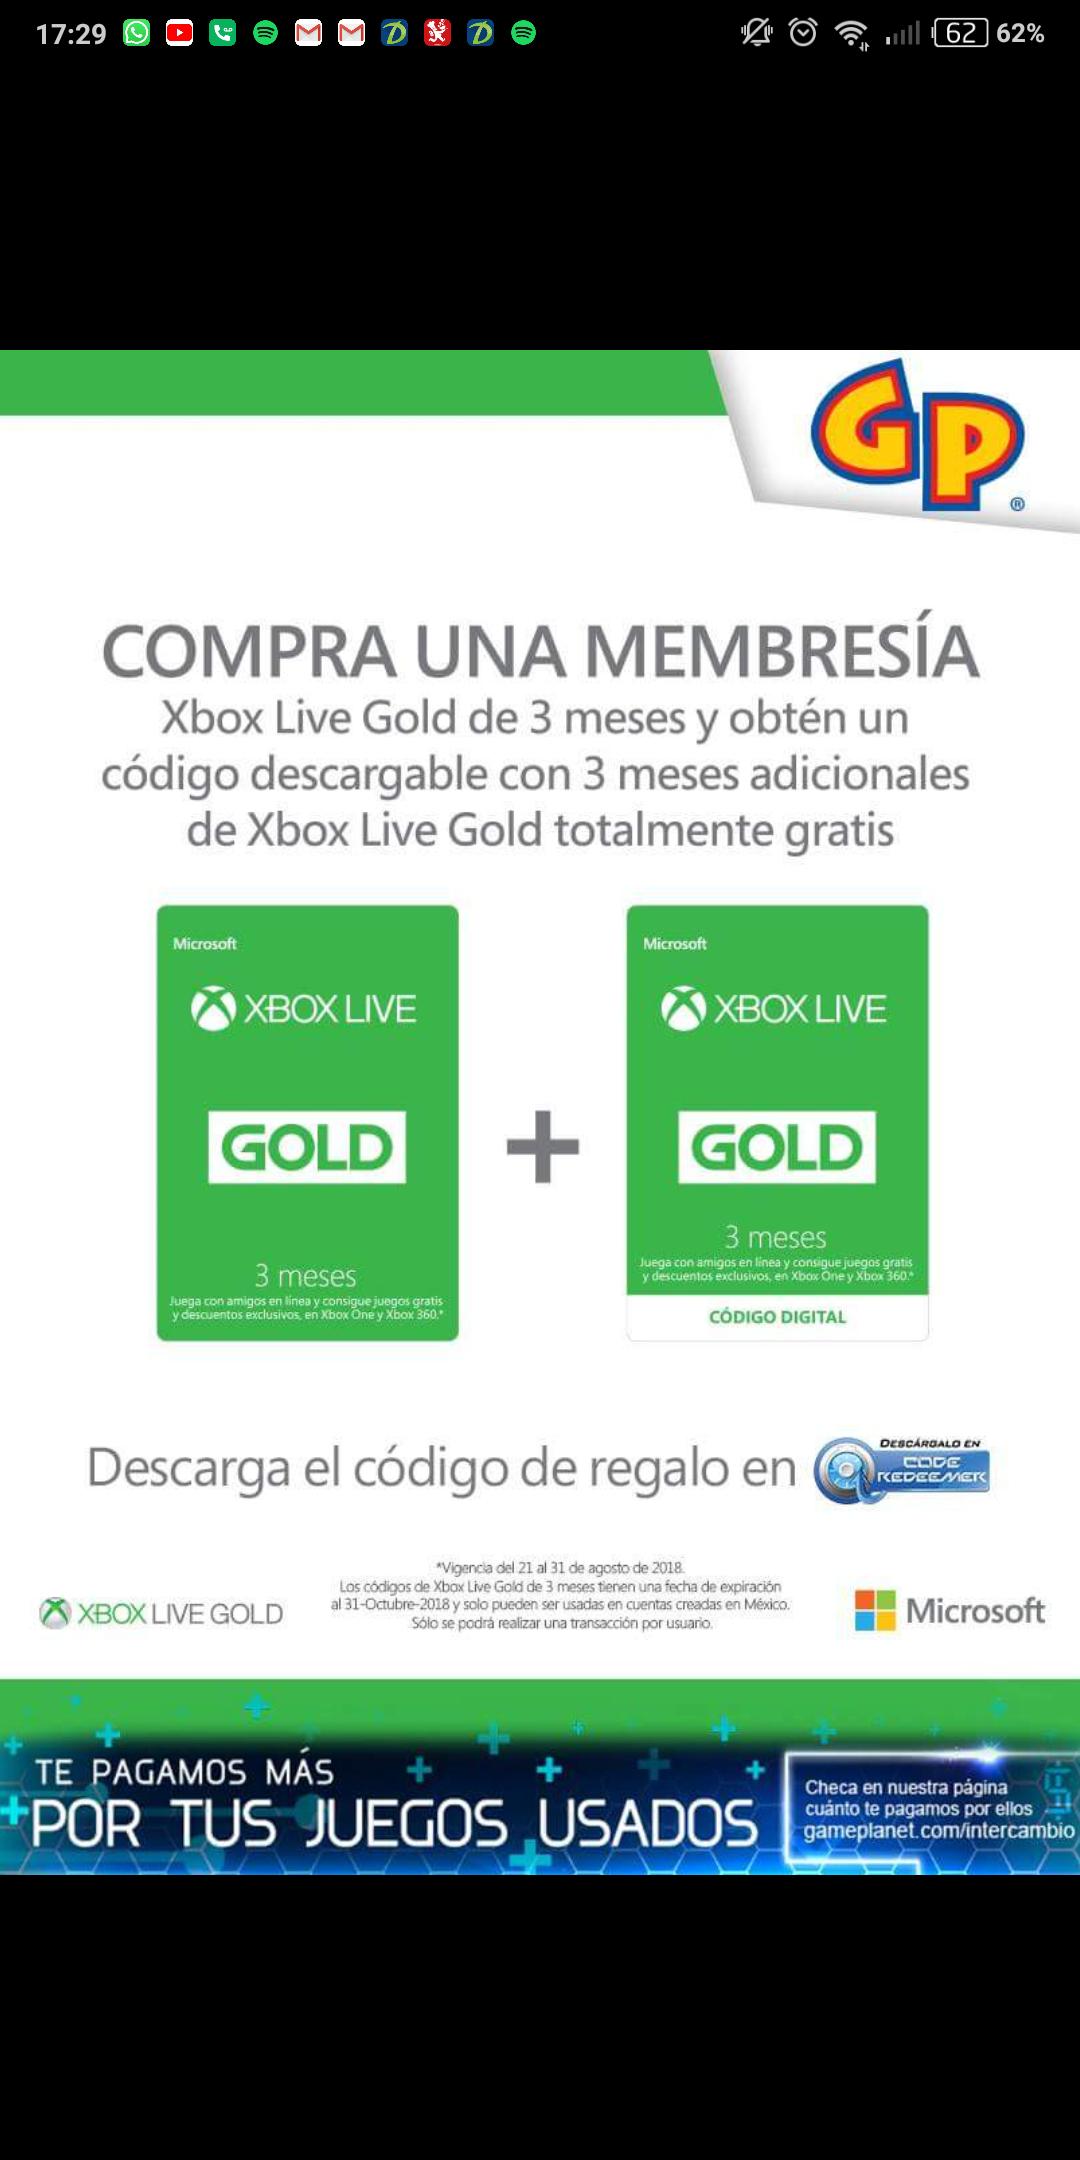 Game Planet: Xbox live 3 meses + 3 meses de regalo